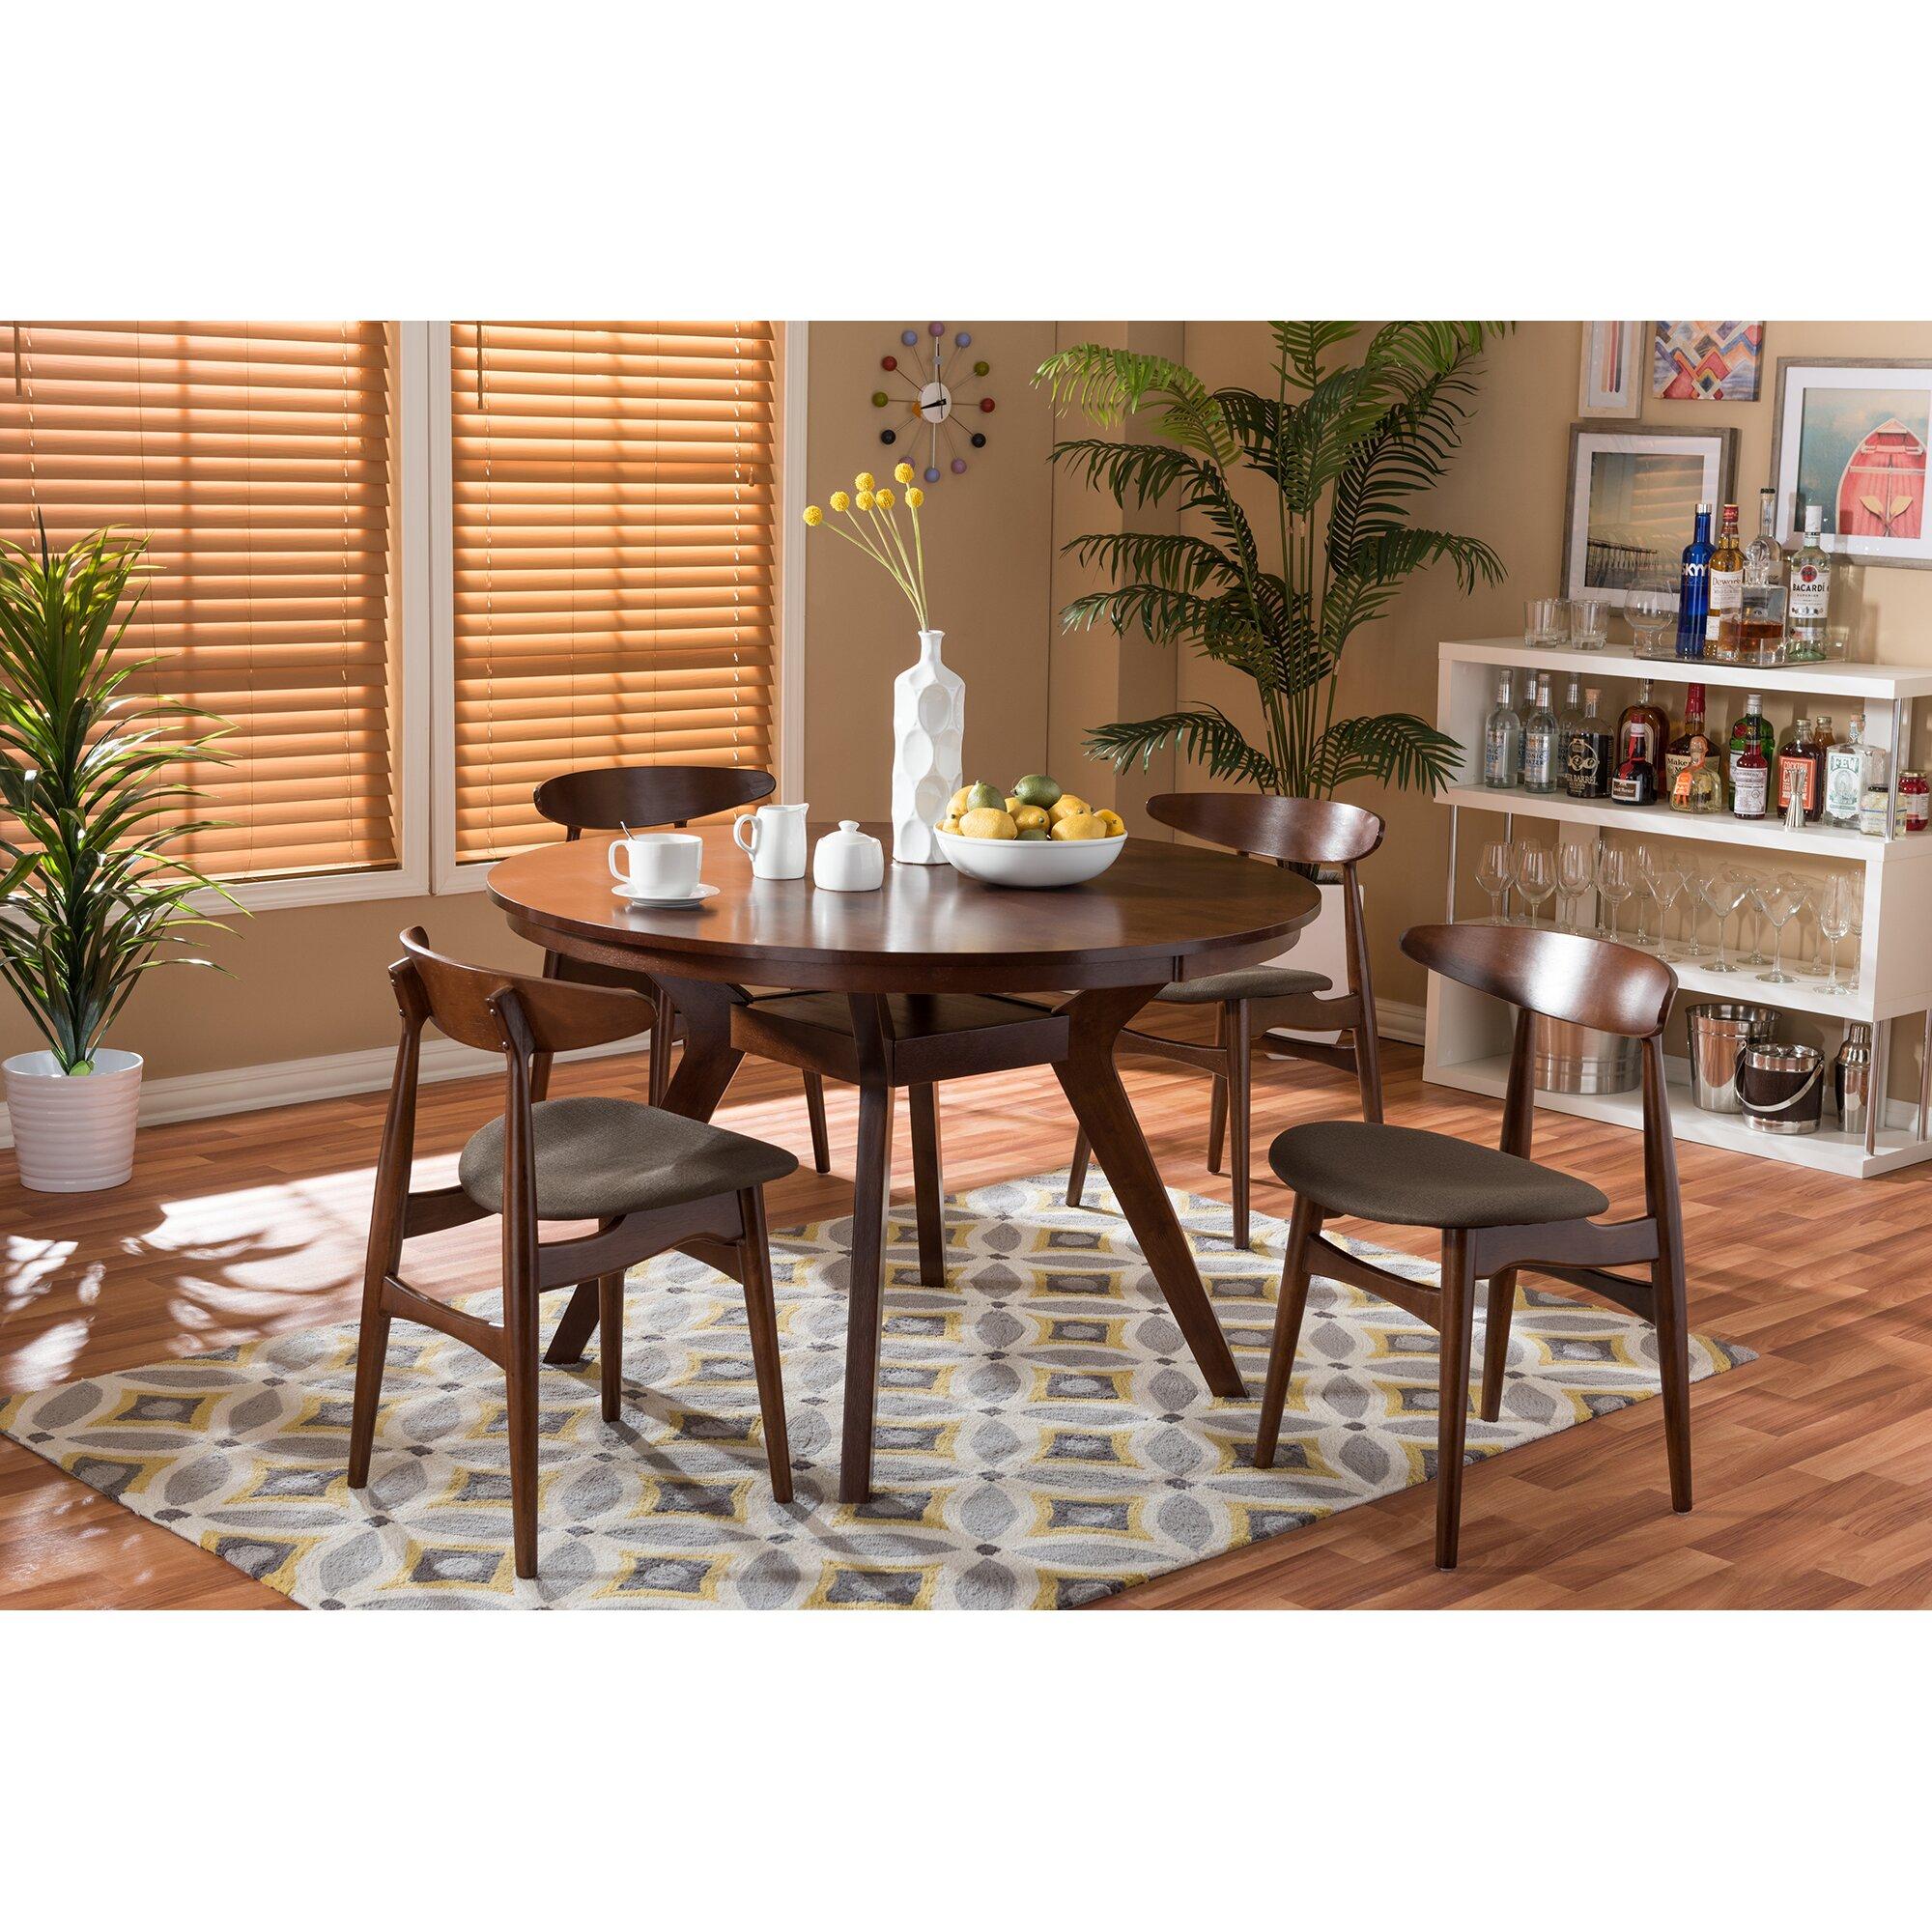 wholesale interiors baxton studio flamingo 5 piece dining